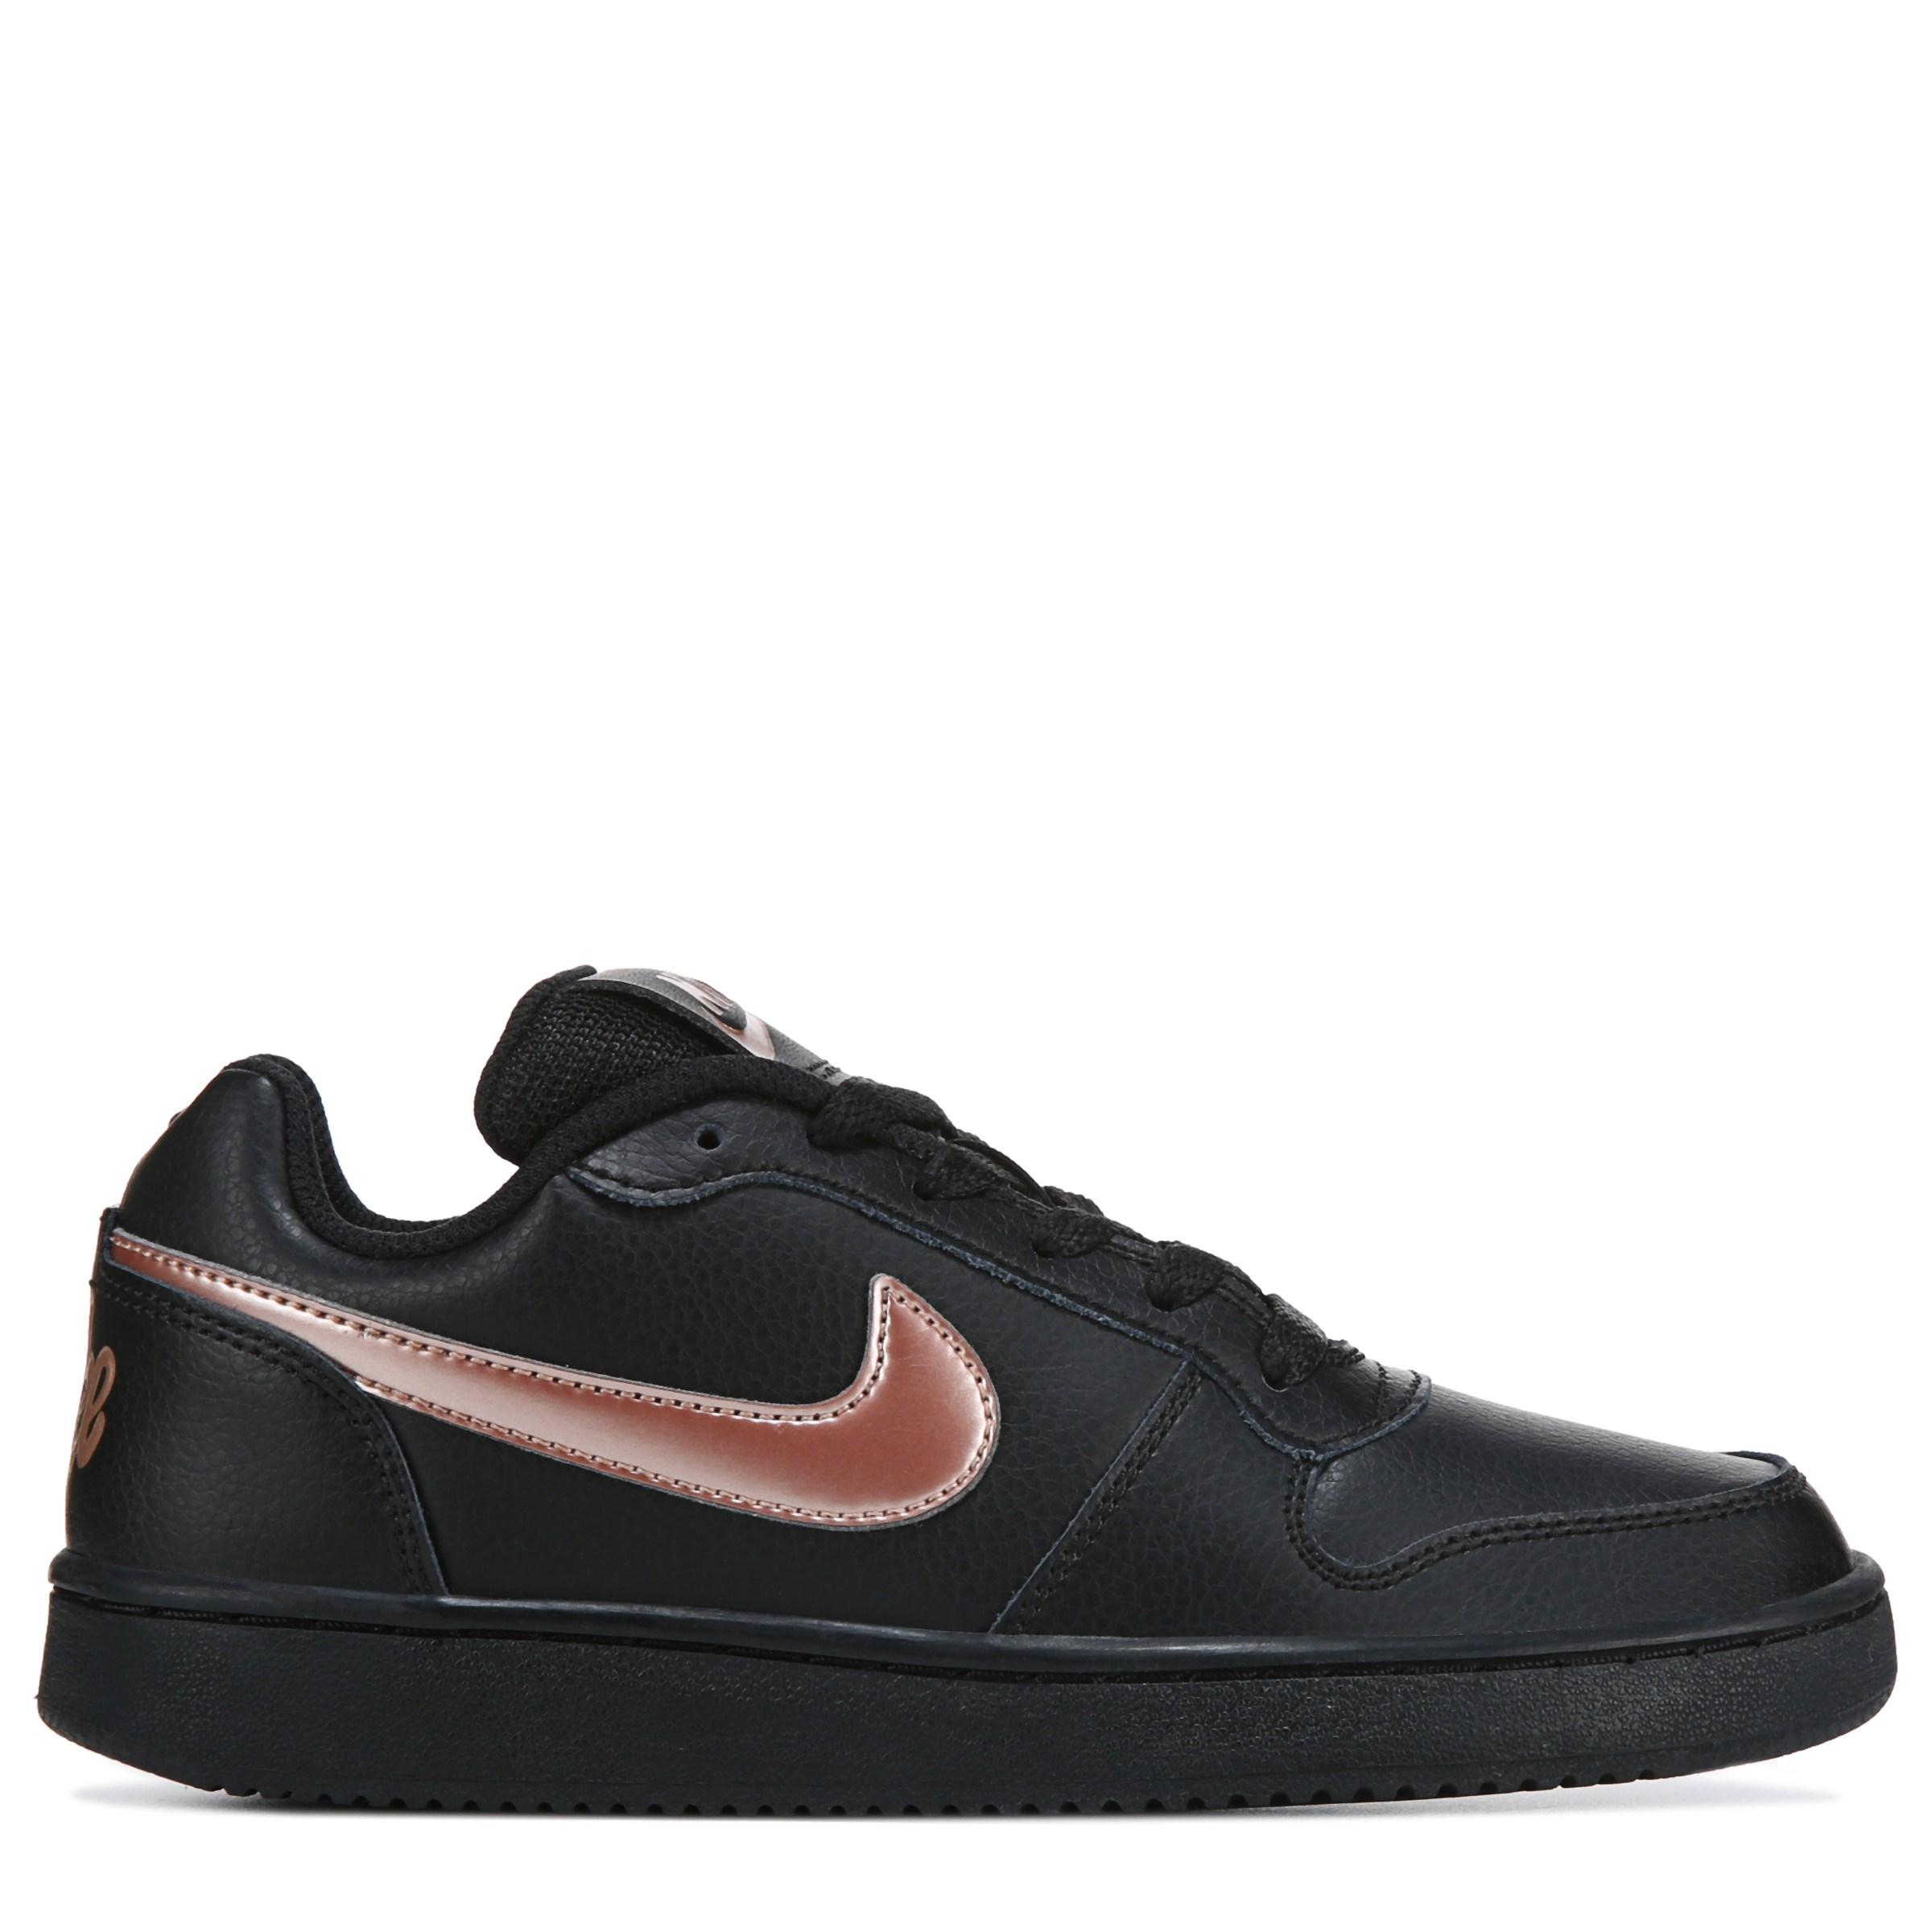 Nike Ebernon Low Athletic Shoe in Black